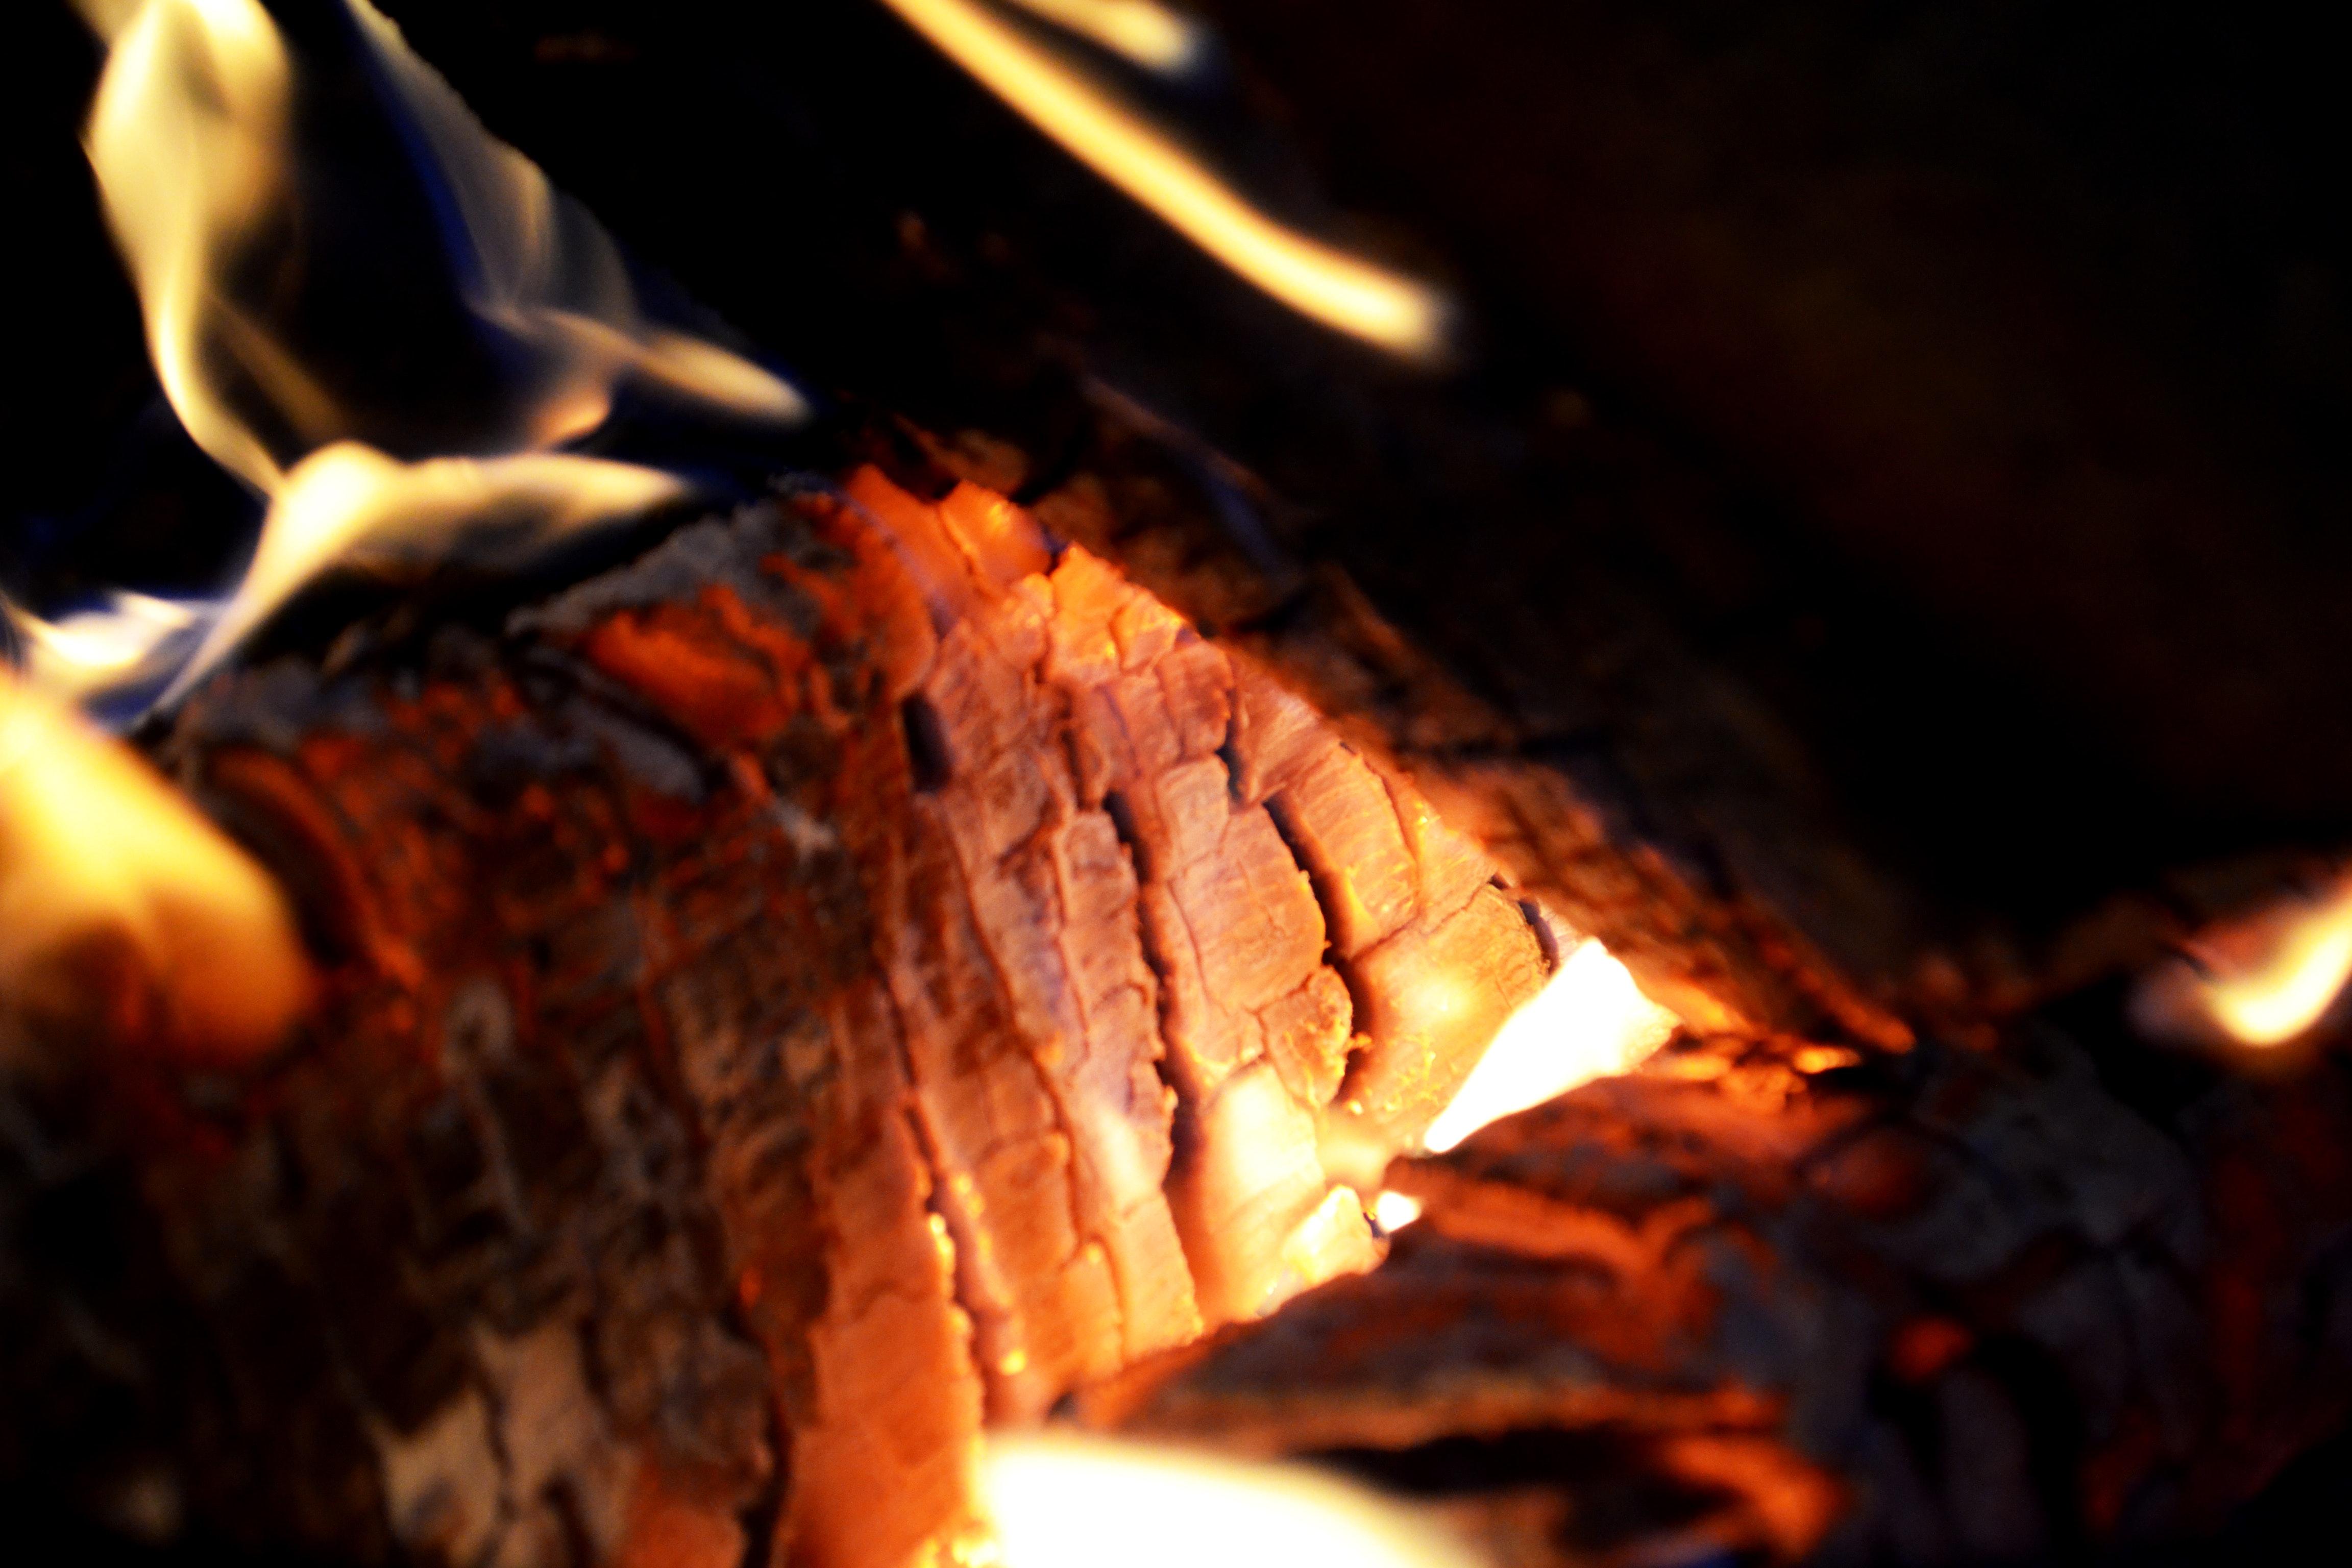 Fireplace Illustration, Hot, Ignite, Heat, Glow, HQ Photo